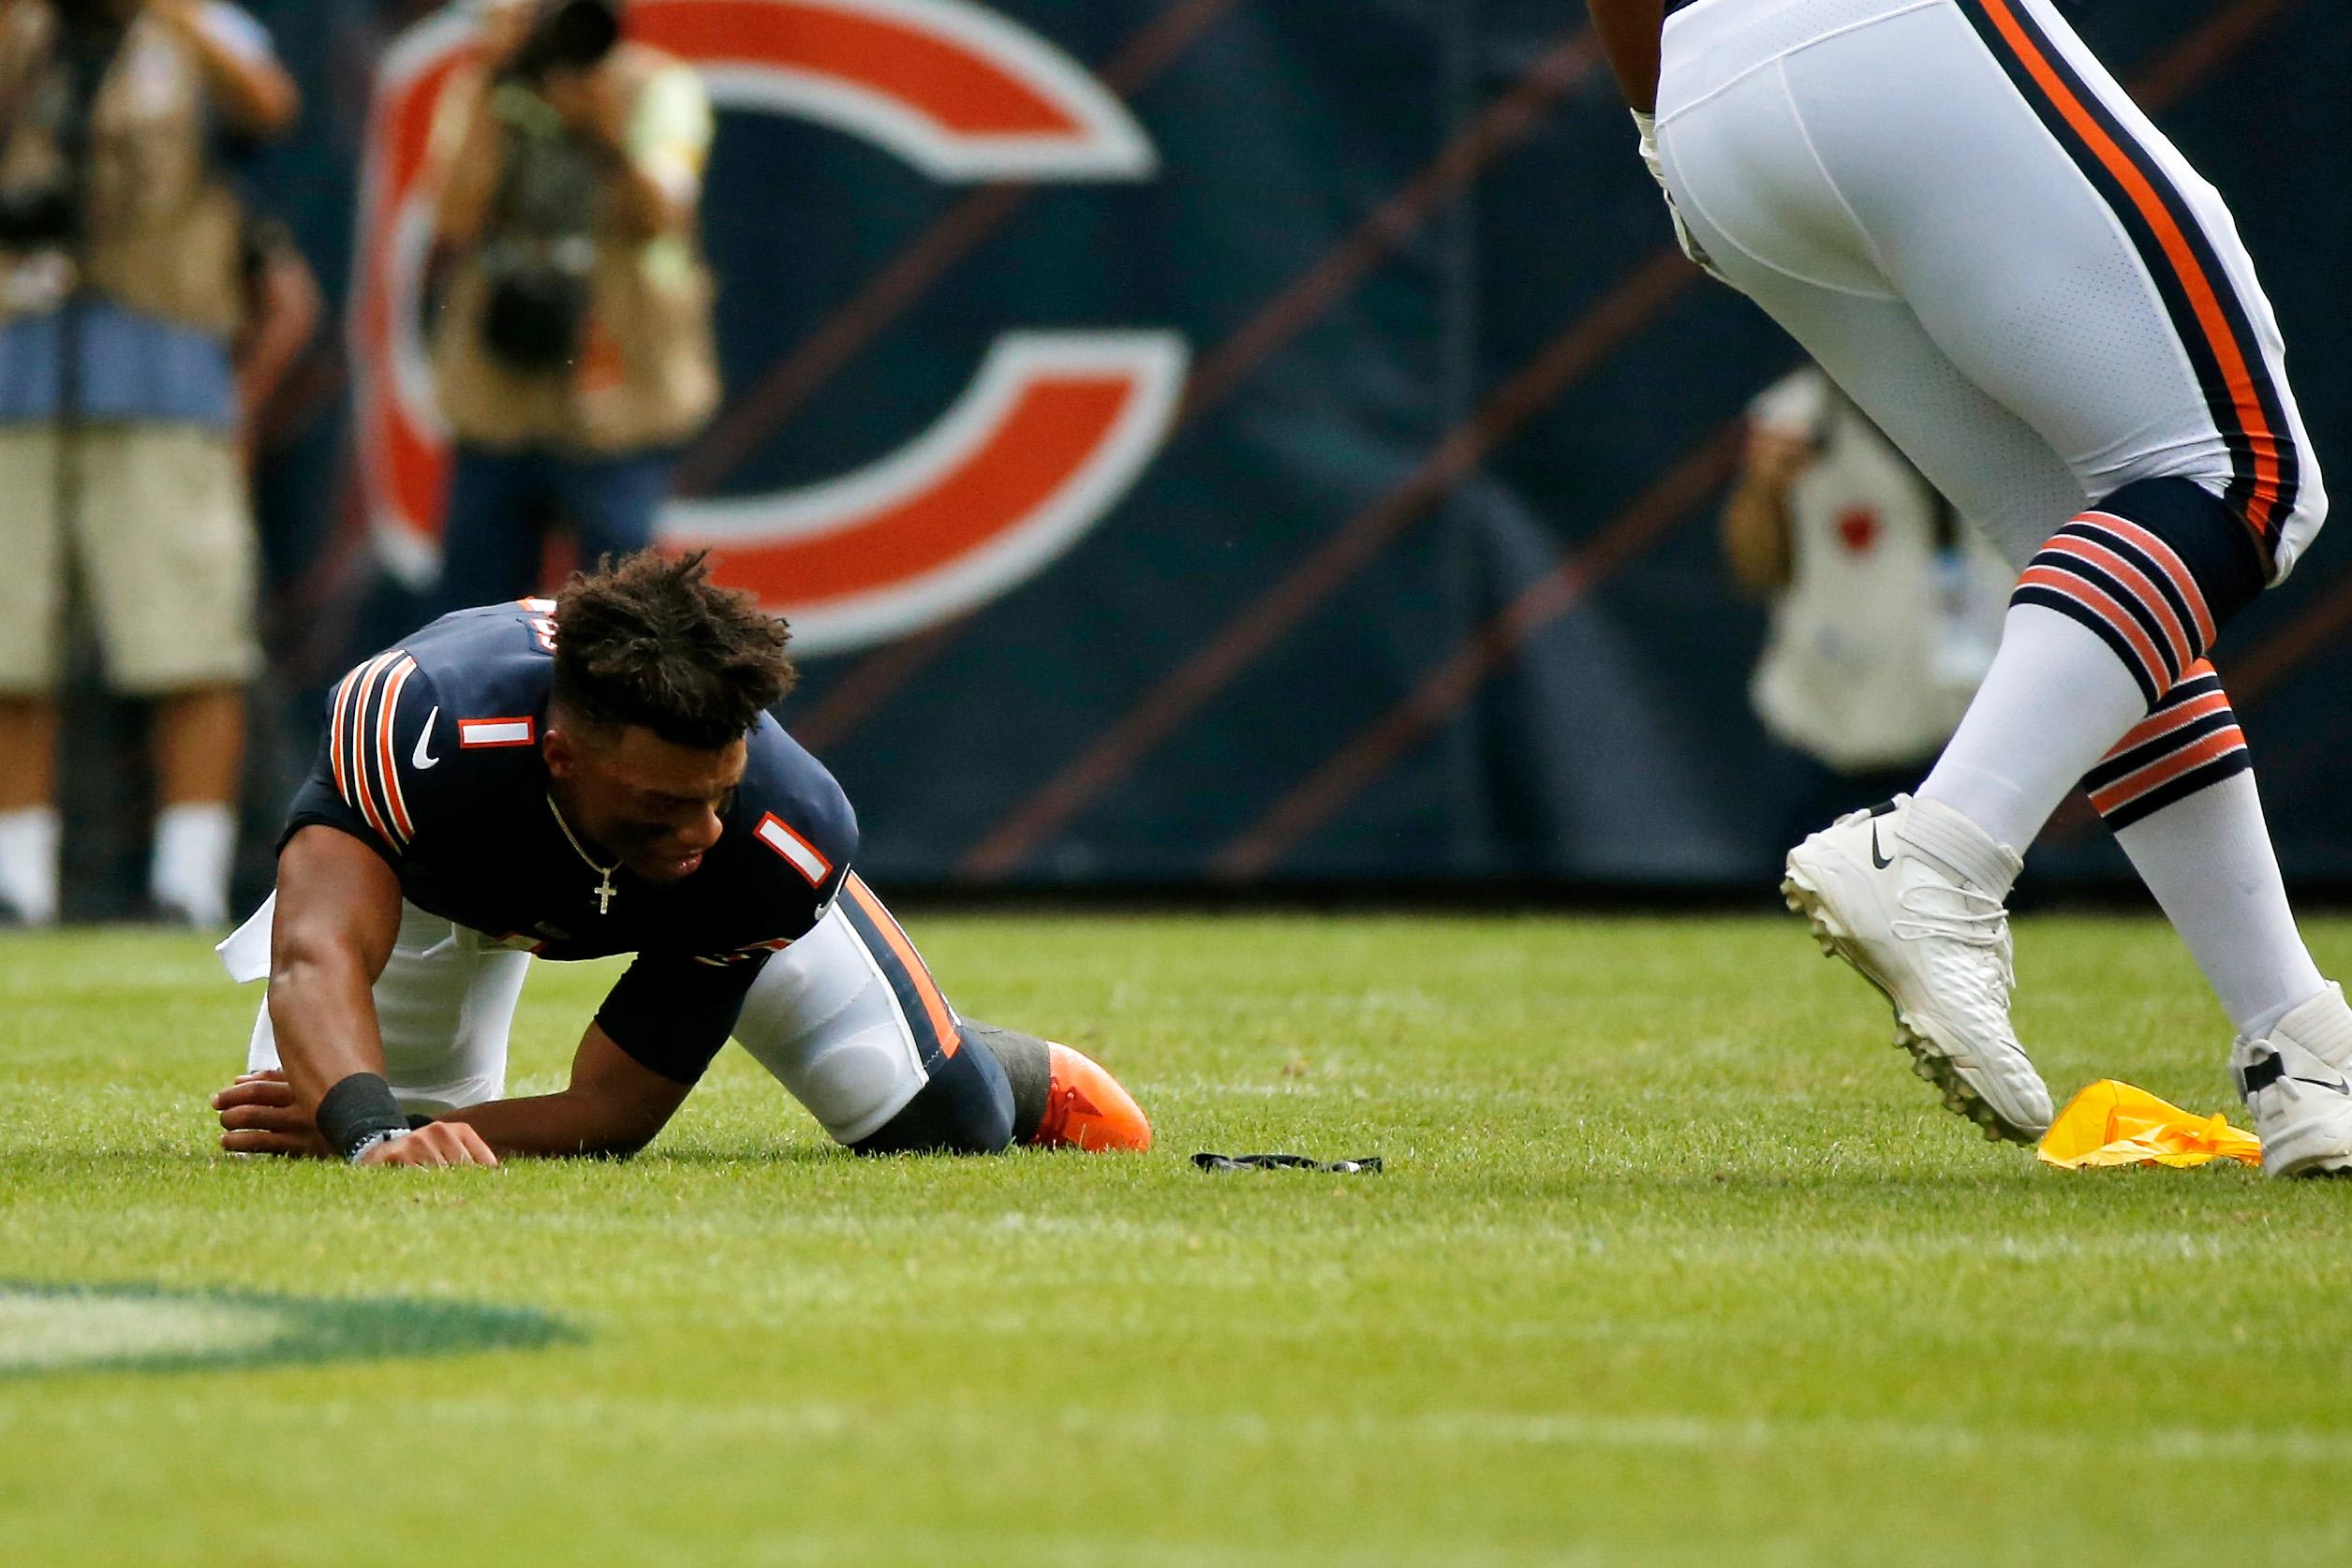 NFL: Buffalo Bills at Chicago Bears